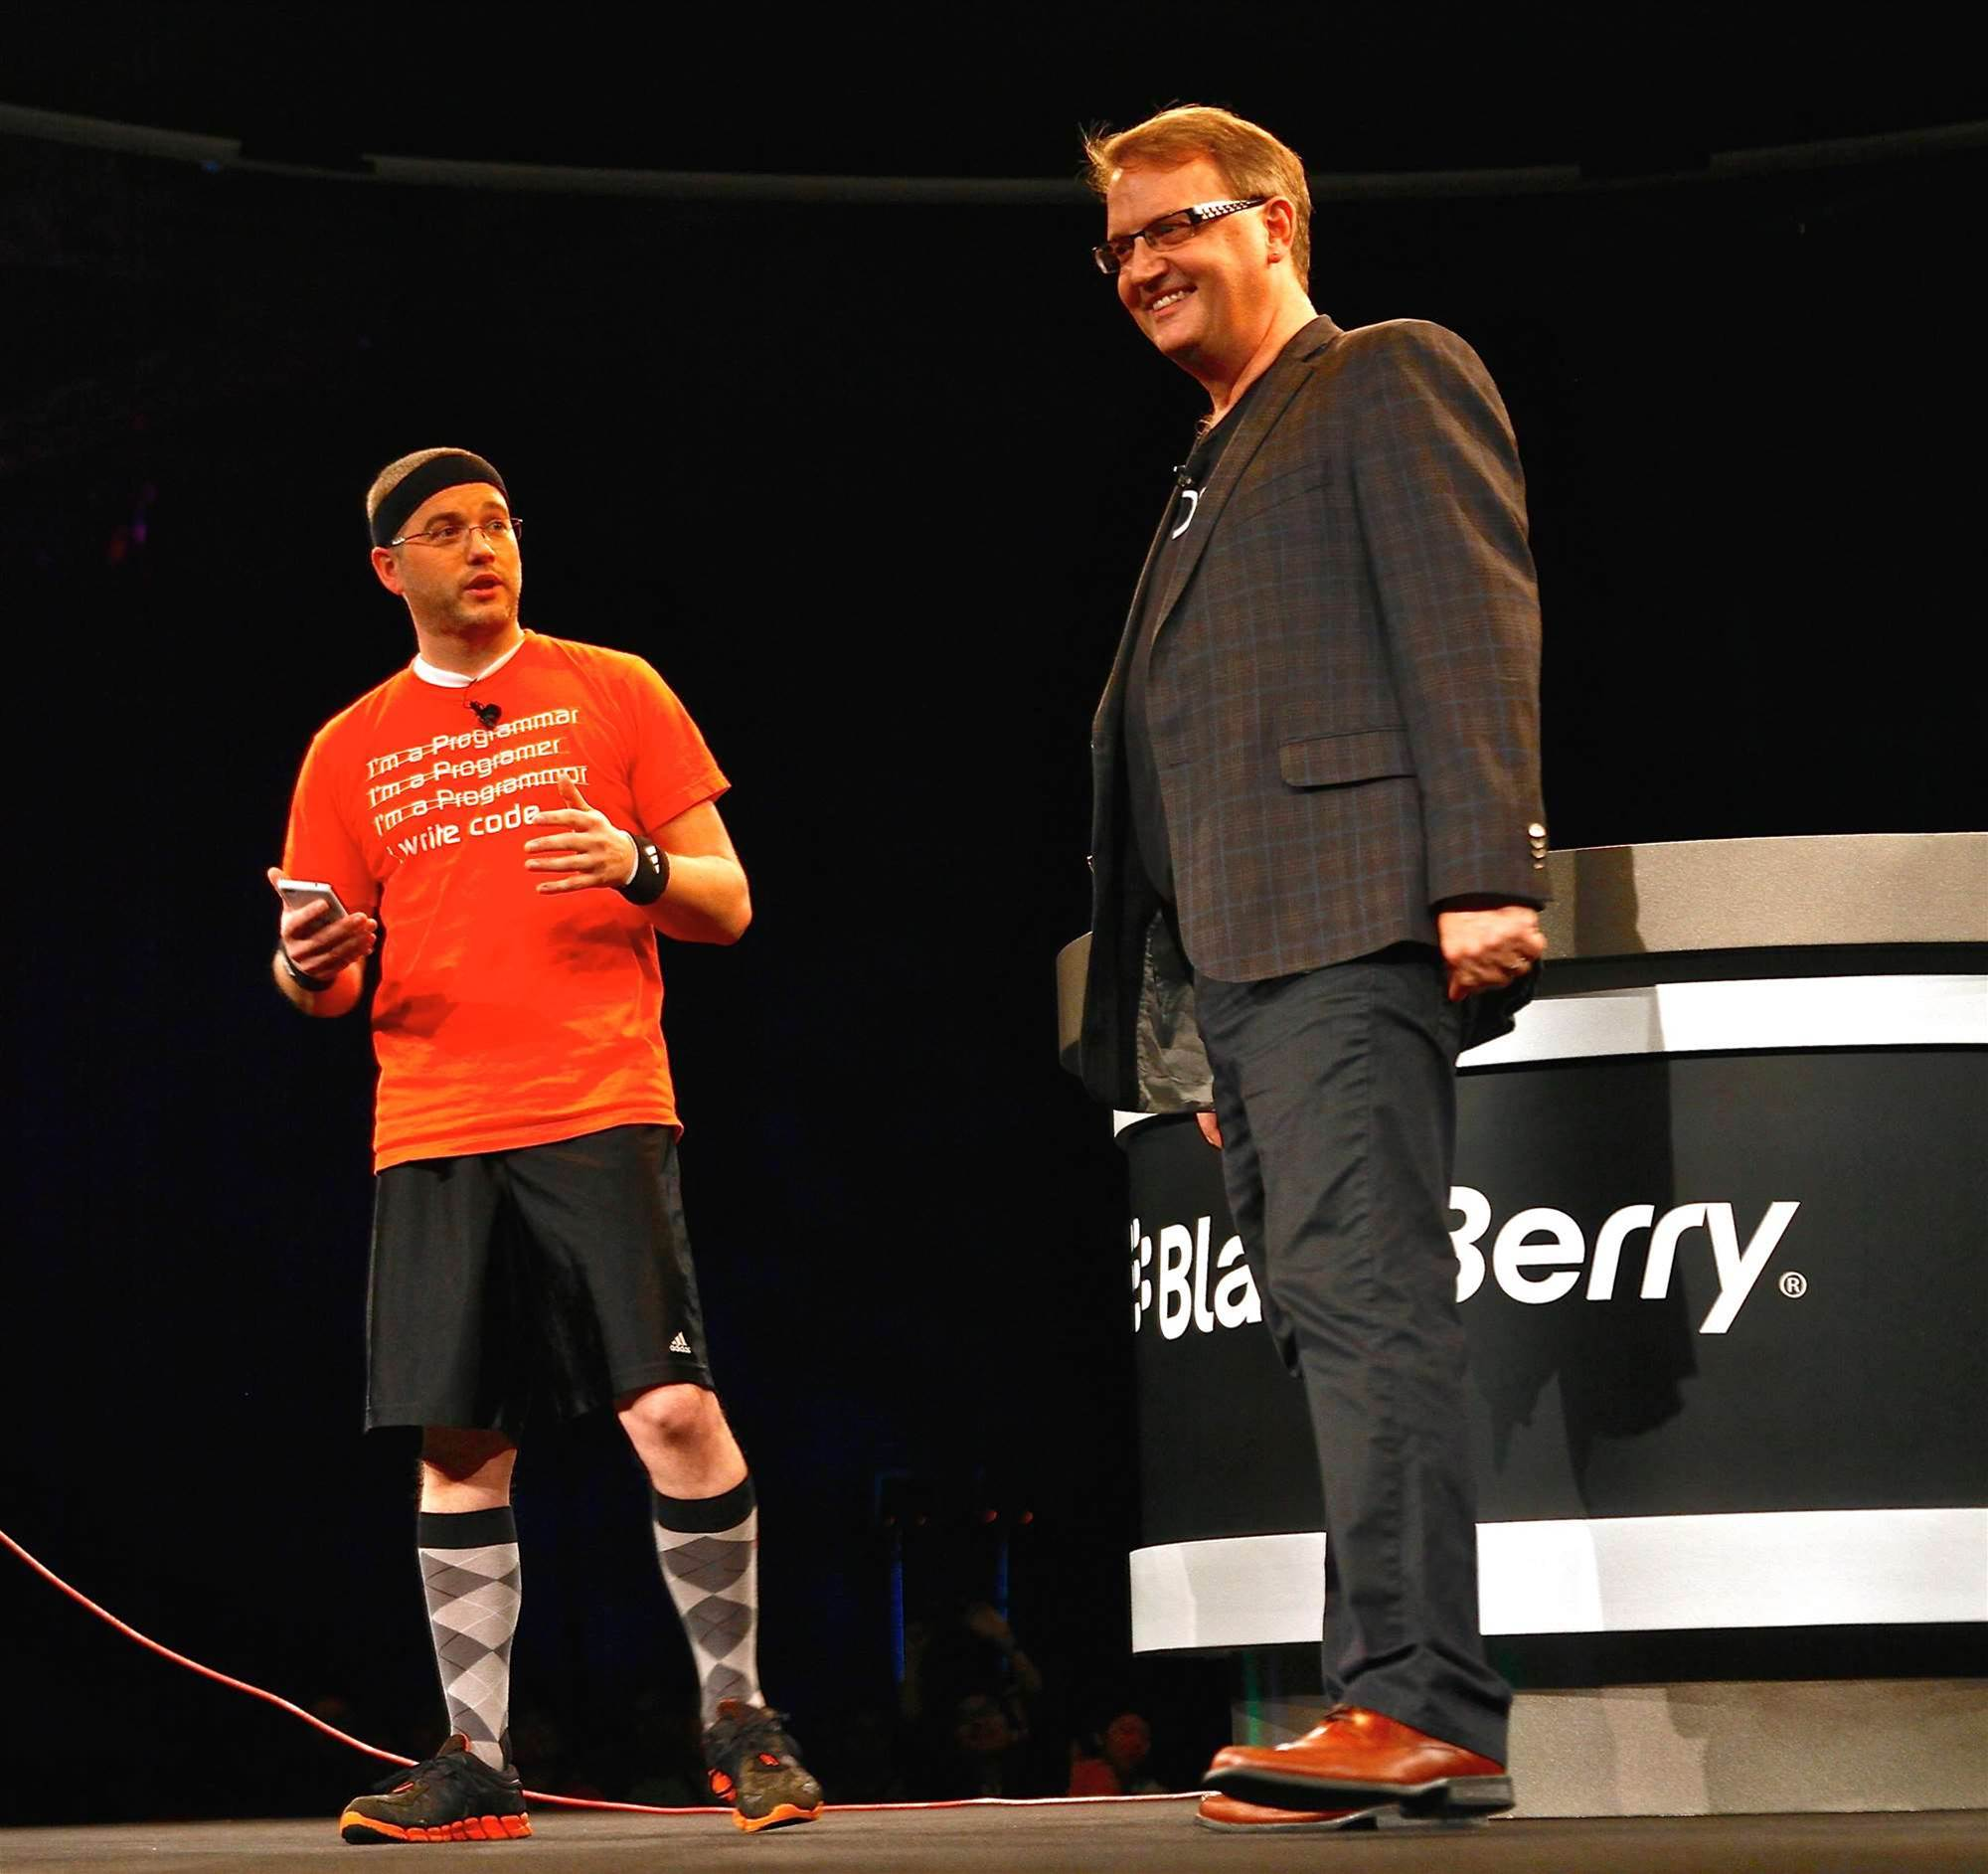 Blackberry VP for developer relations demos a wireless heart rate app